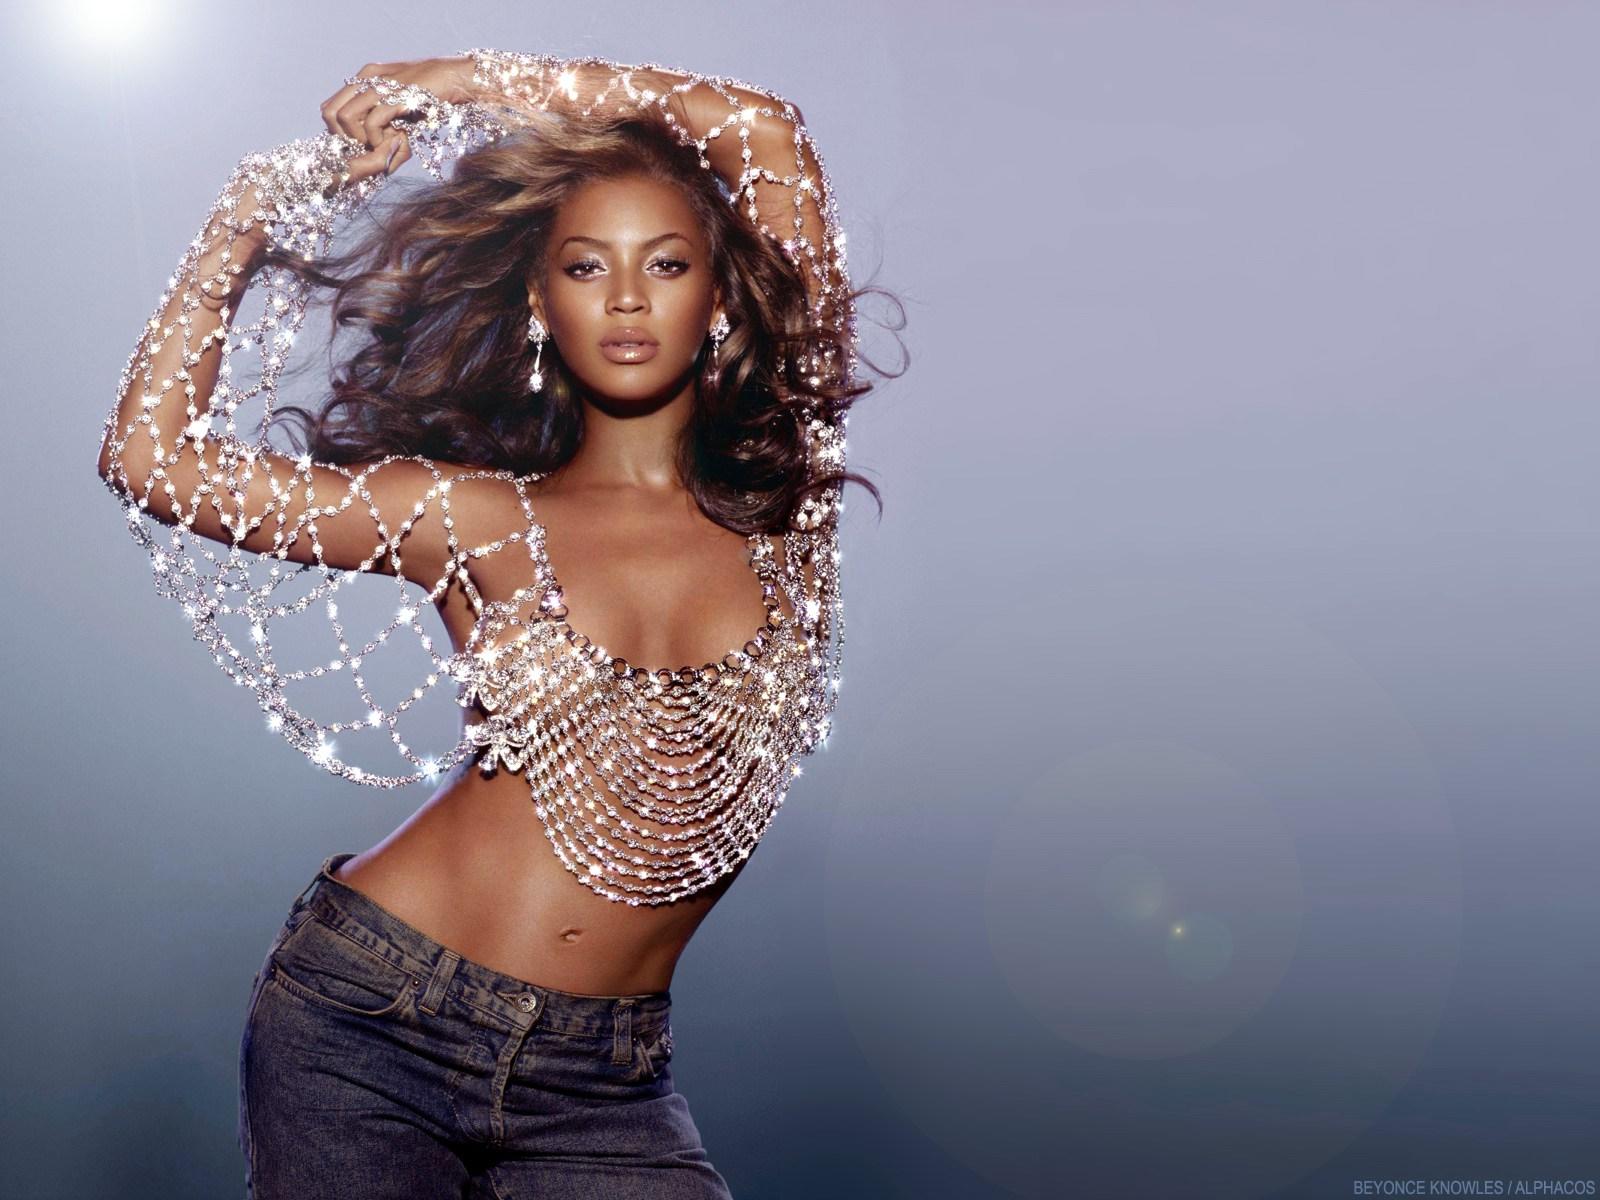 http://2.bp.blogspot.com/-Z4D5wHlUAbo/TkYW5fhcysI/AAAAAAAABNs/_JGbVsBqvRA/s1600/Beyonce+Knowles+180.jpg